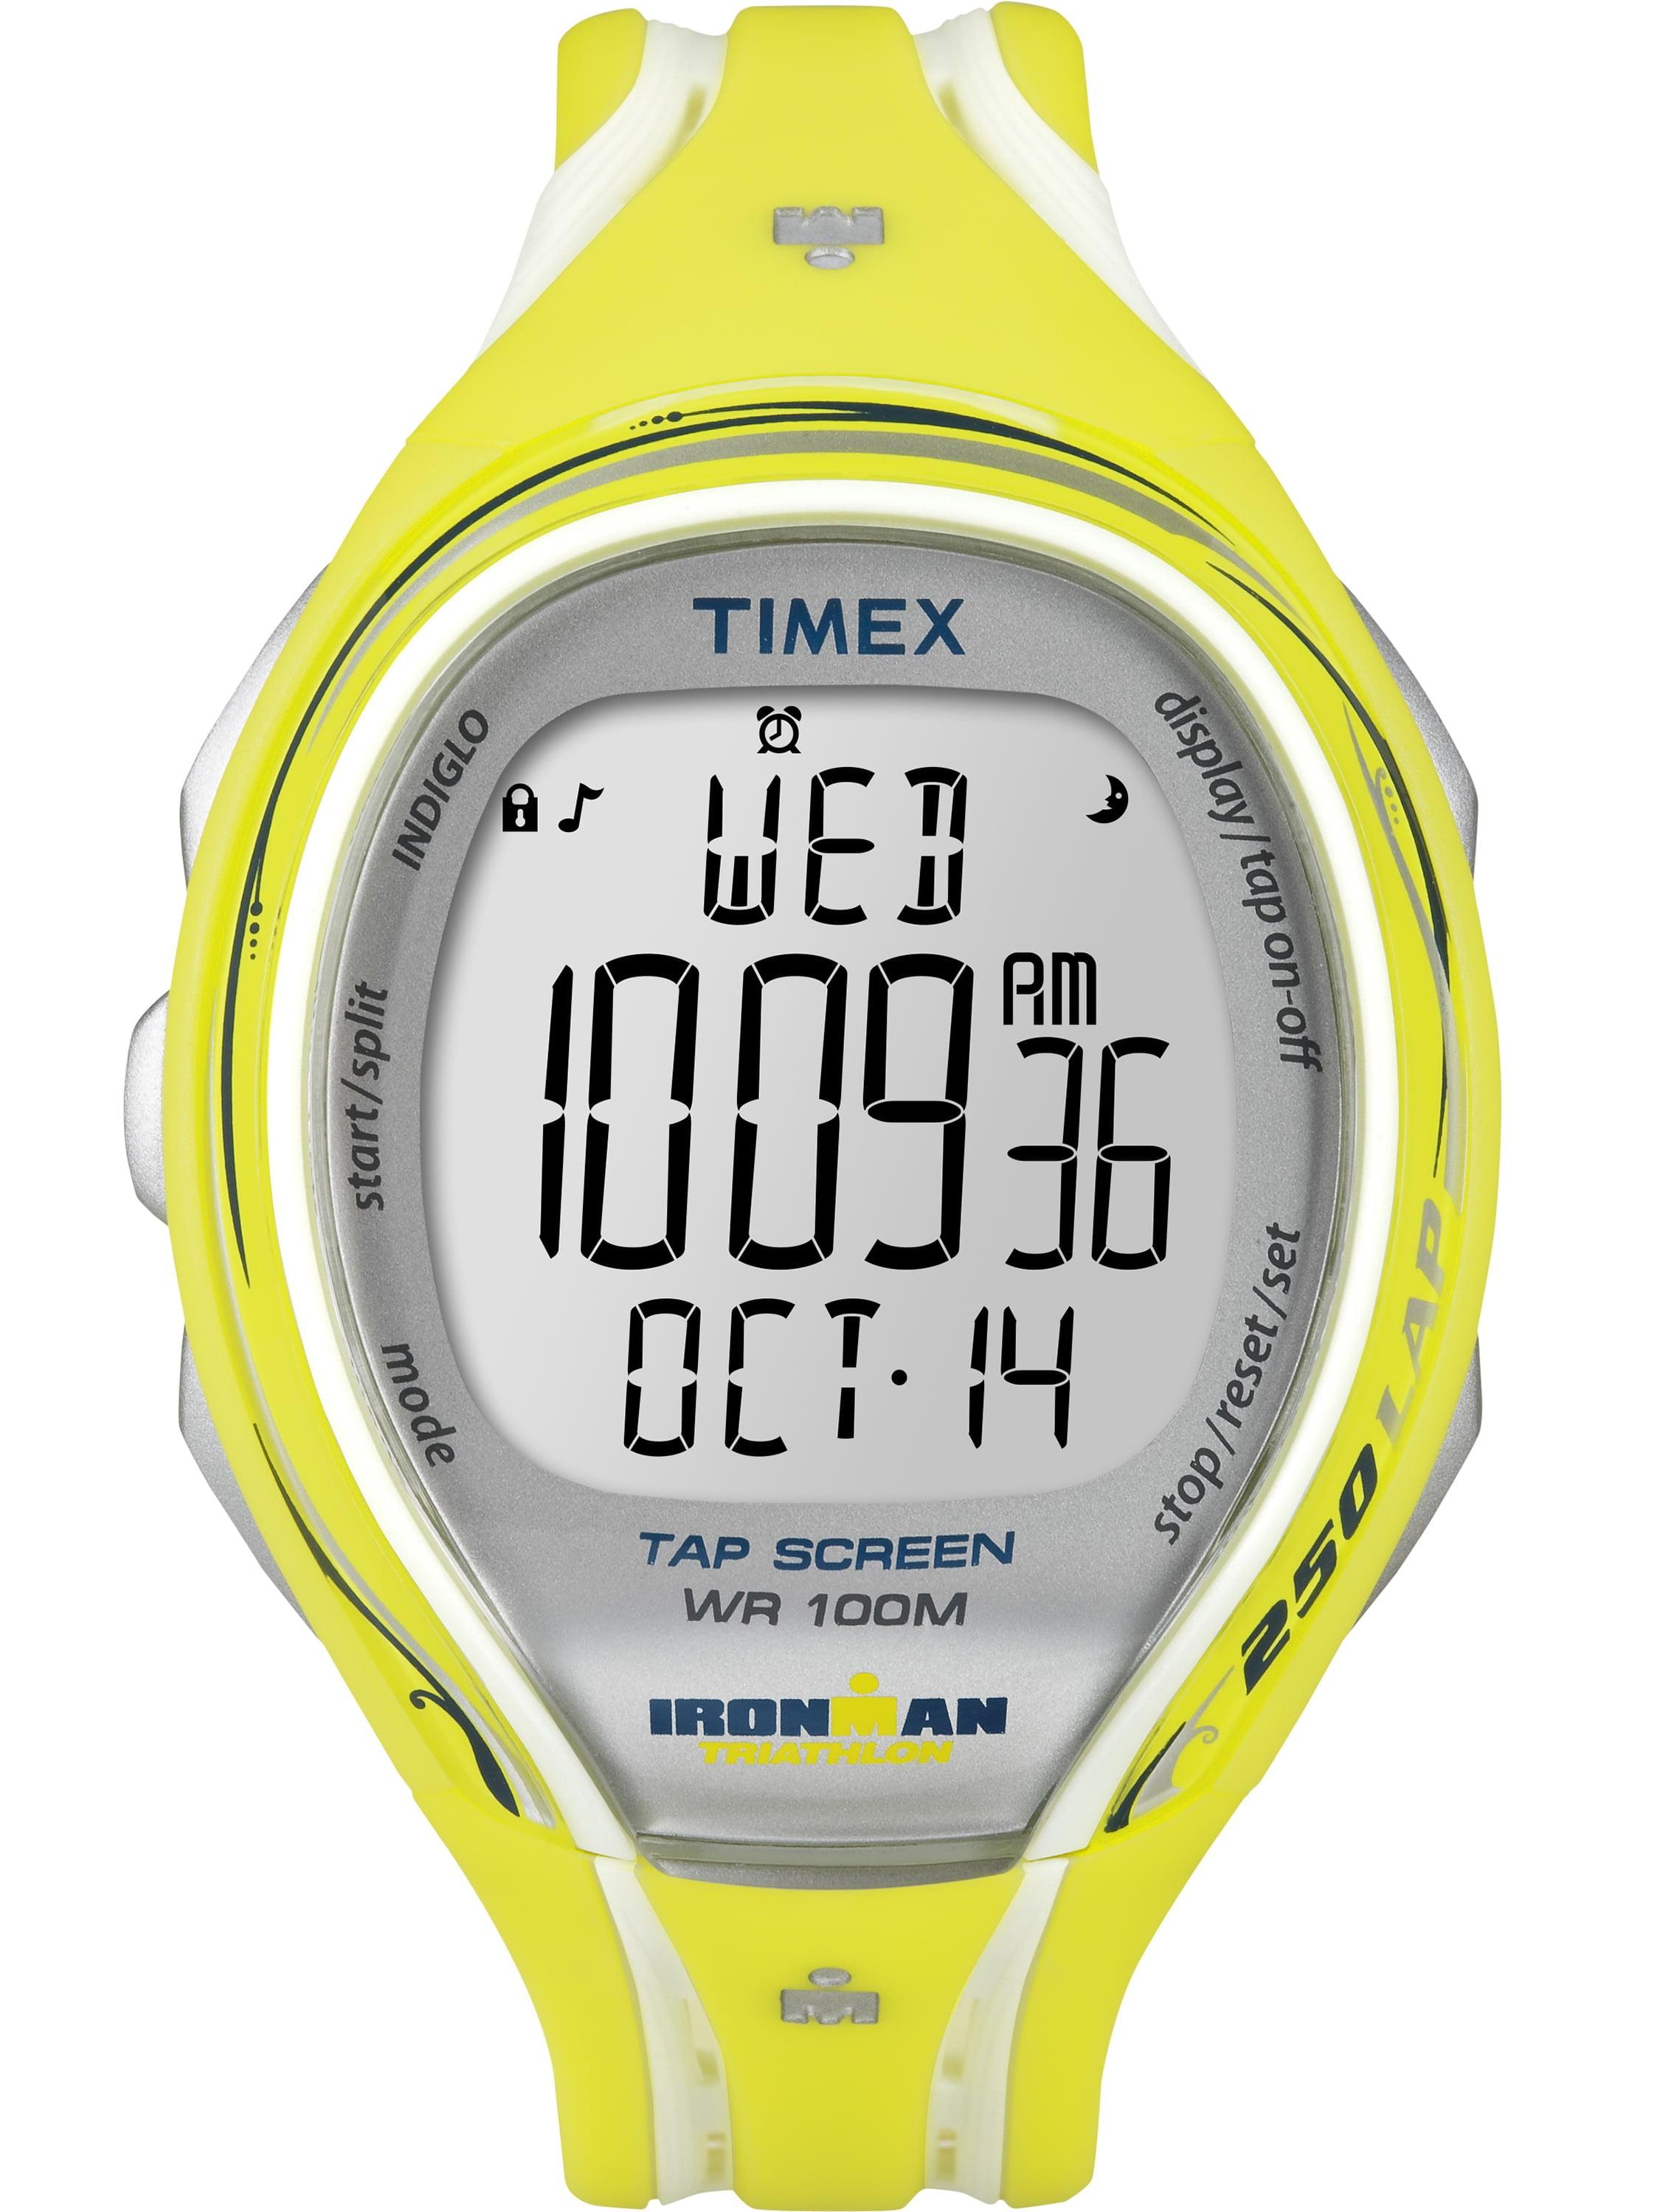 Timex  Women's T5K789 Ironman Sleek 250 TapScreen Yellow Resin Strap Watch